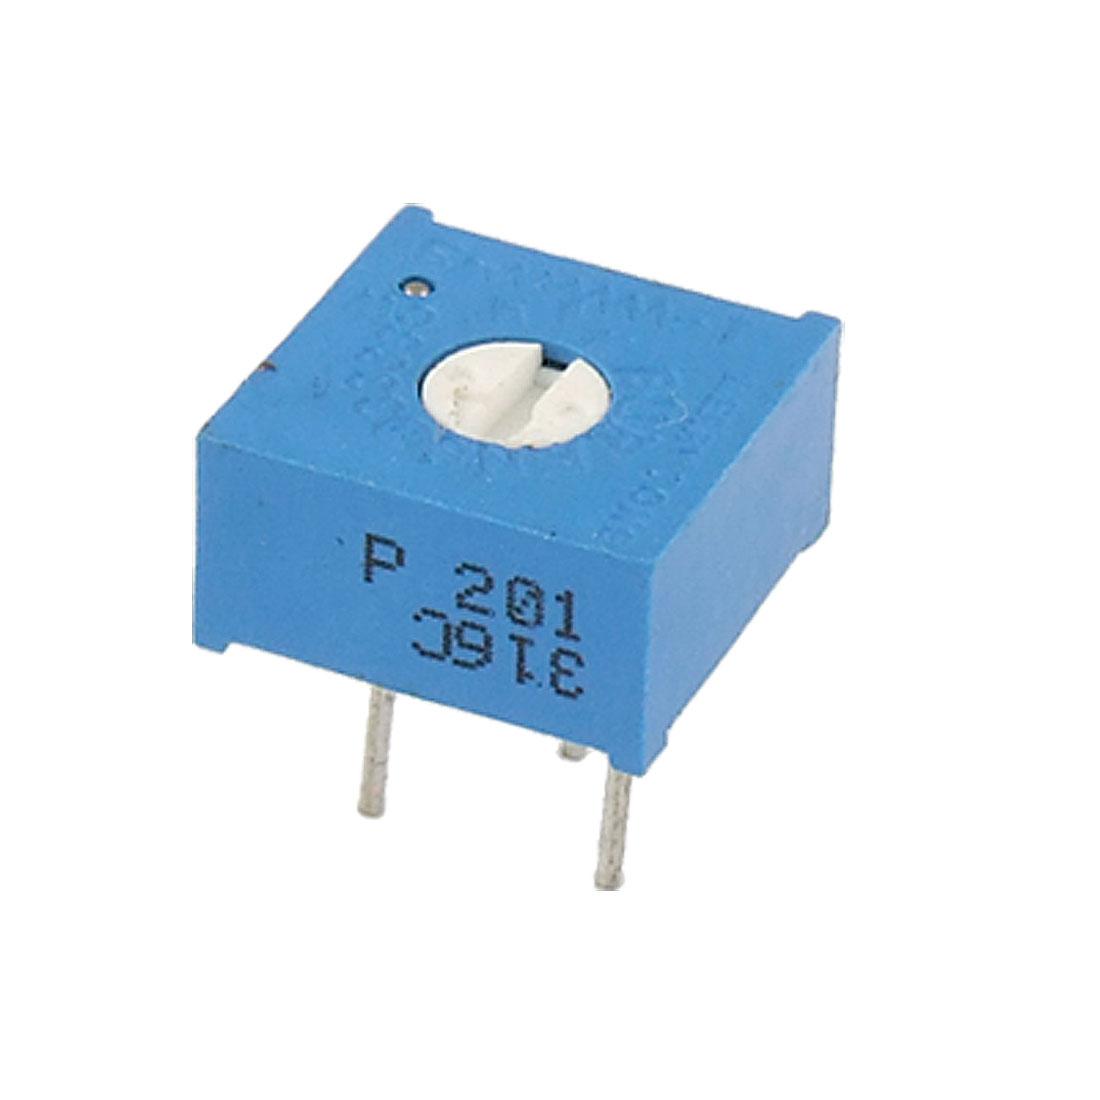 200 Ohm 500V Trimmer Cermet Variable Resistor Potentiometers 50 Pcs